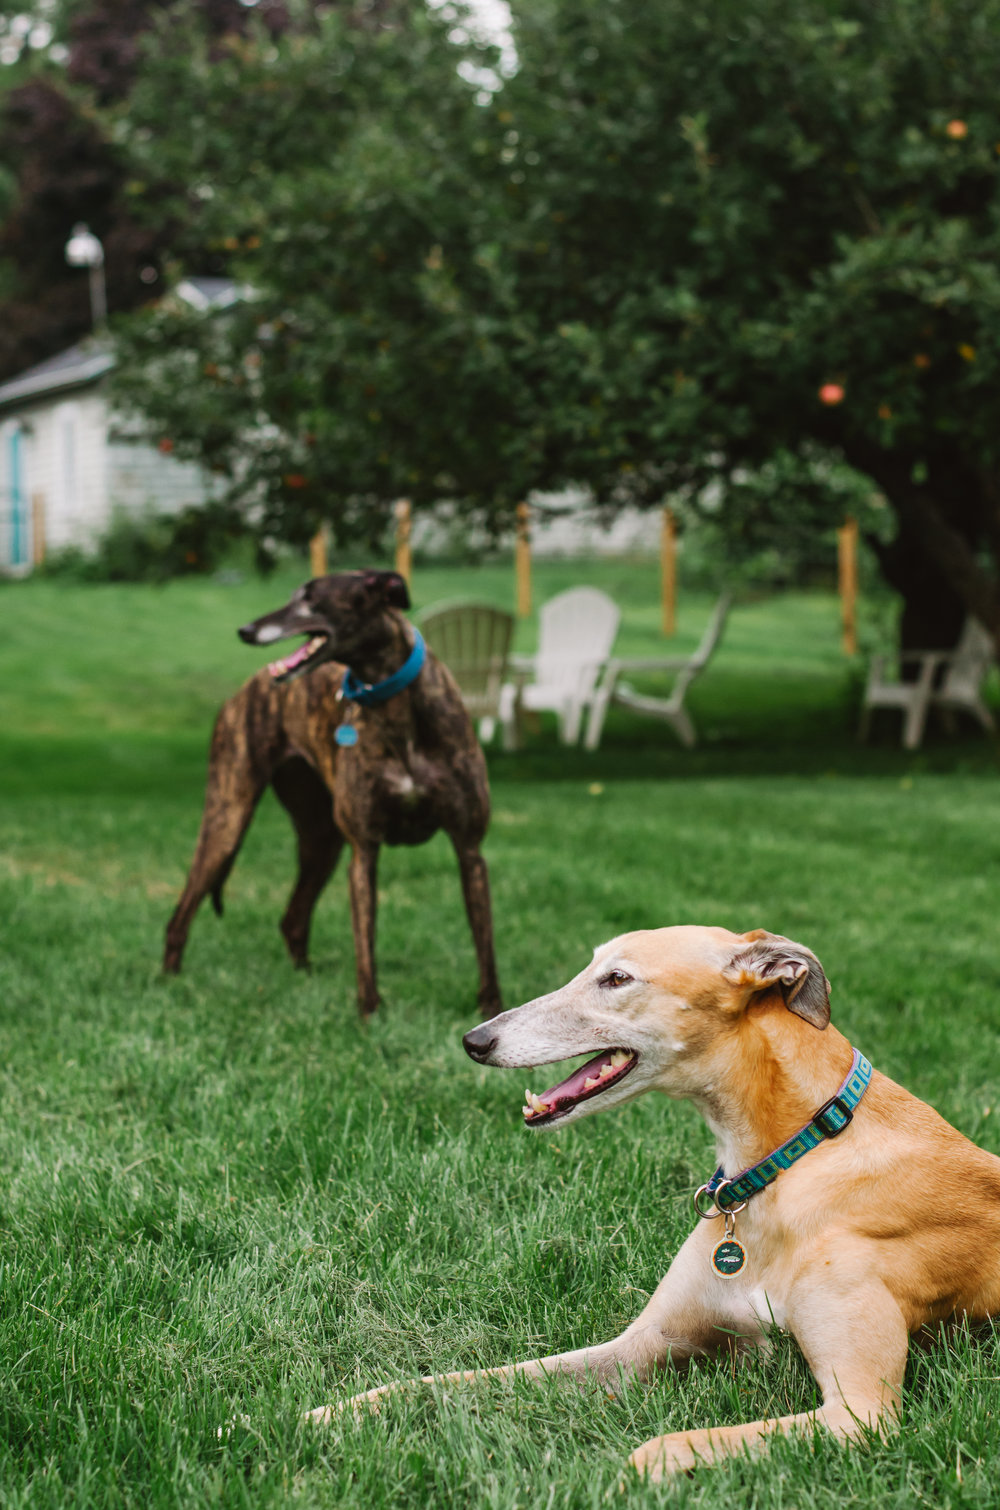 160825_Helen, SHane, & the greyhounds_66.JPG